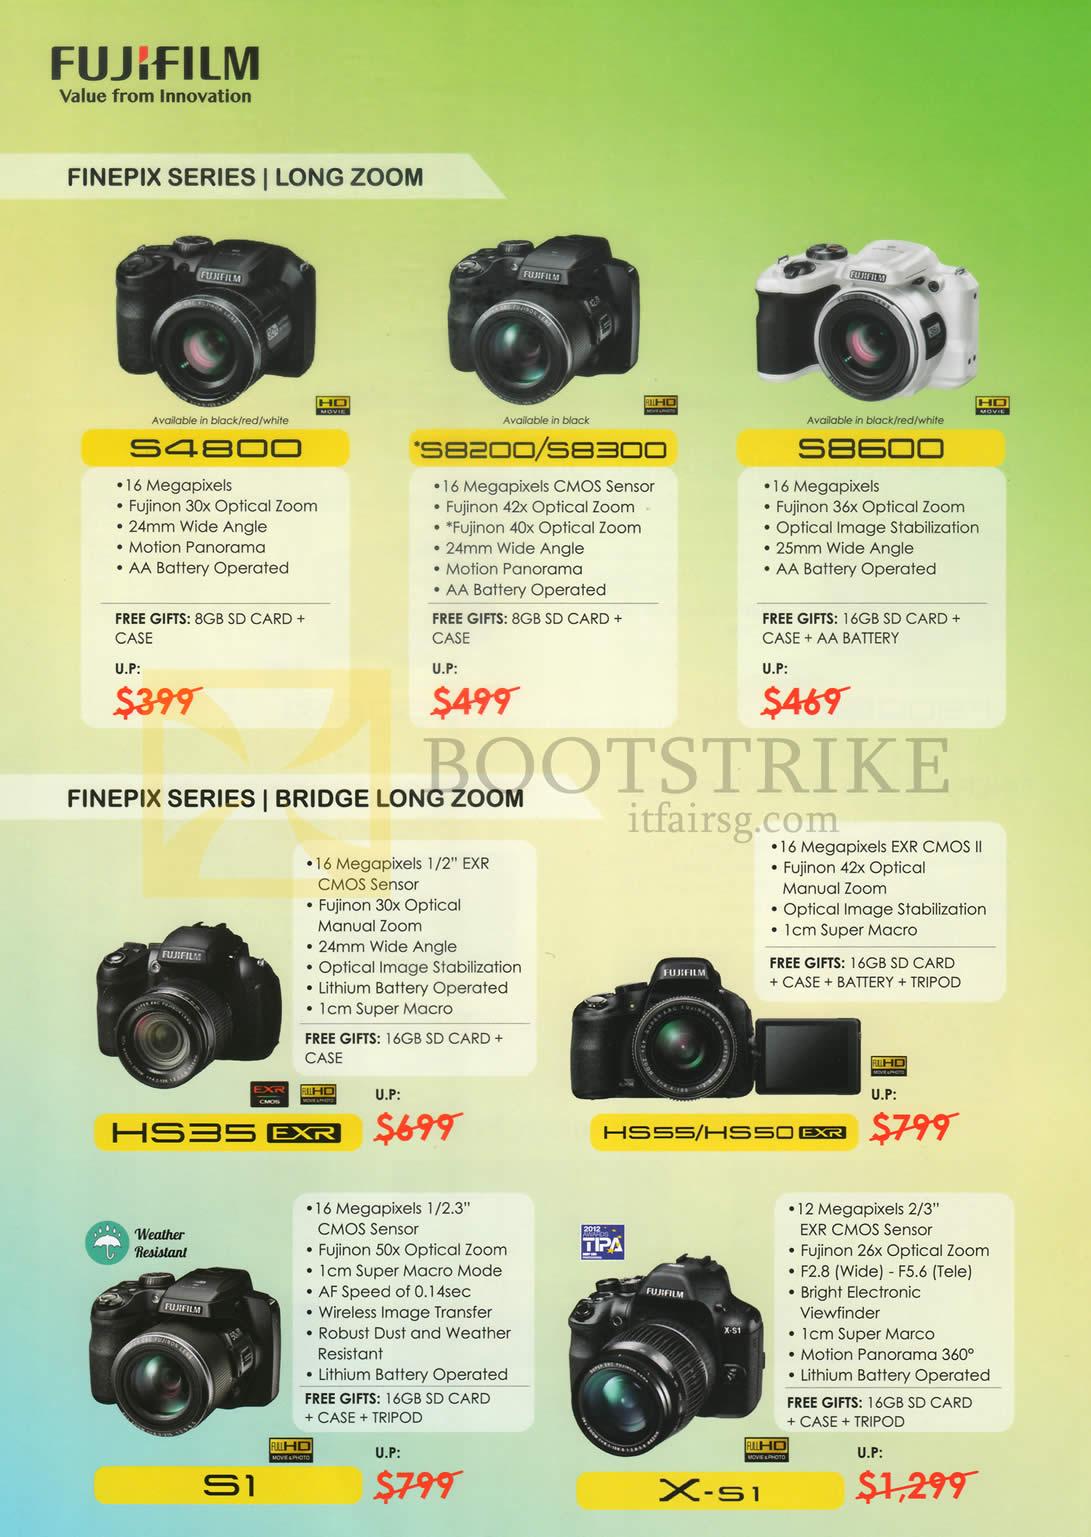 Camera Fujifilm Dslr Camera Price fujifilm camera deal in town prices singapore digital cameras finepix s4800 s8200 s8300 hs35 hs55 hs50 s1 x s1